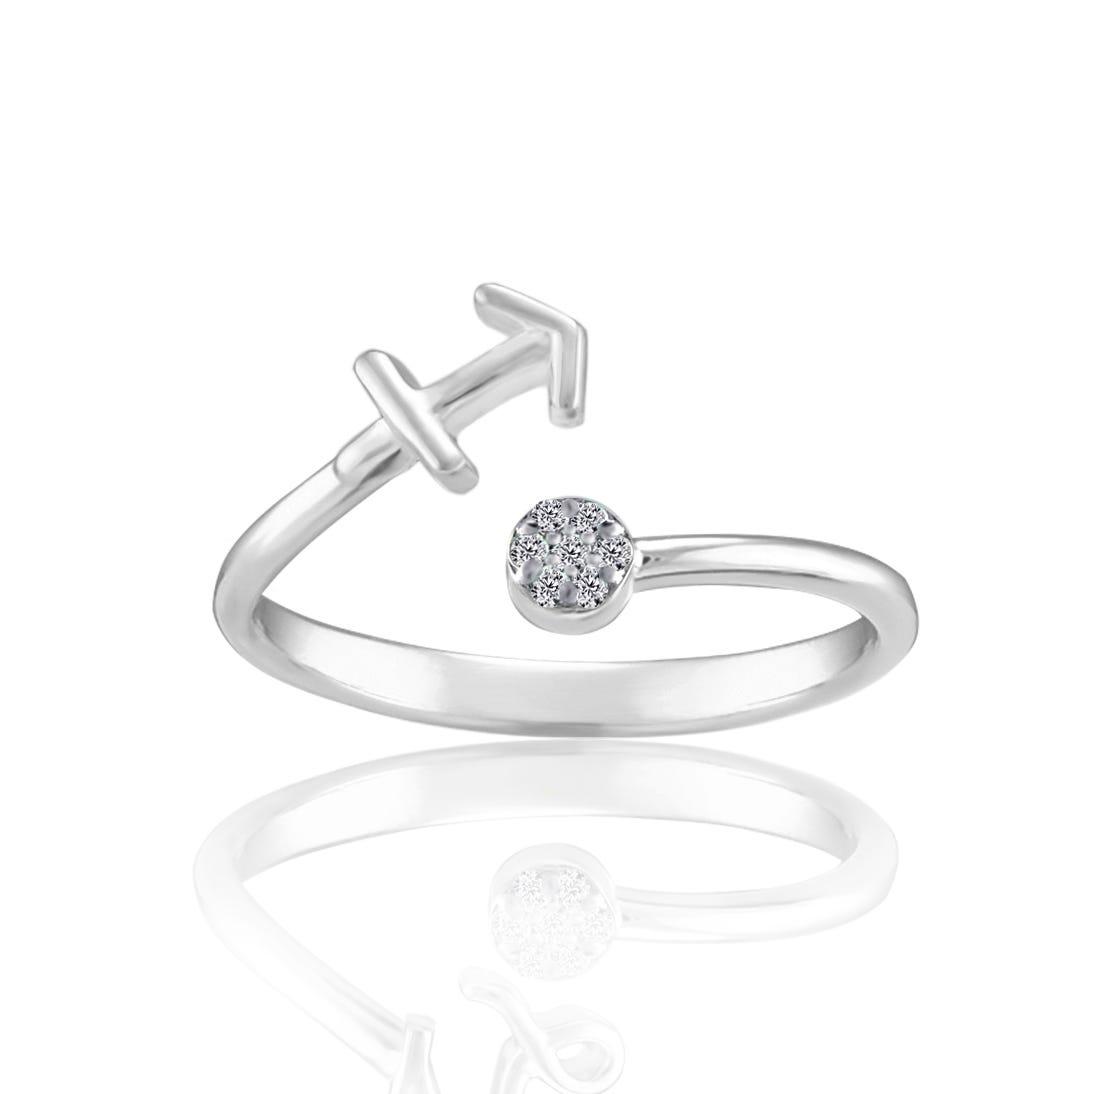 Zodiac Diamond Sagittarius Fashion Ring in Sterling Silver